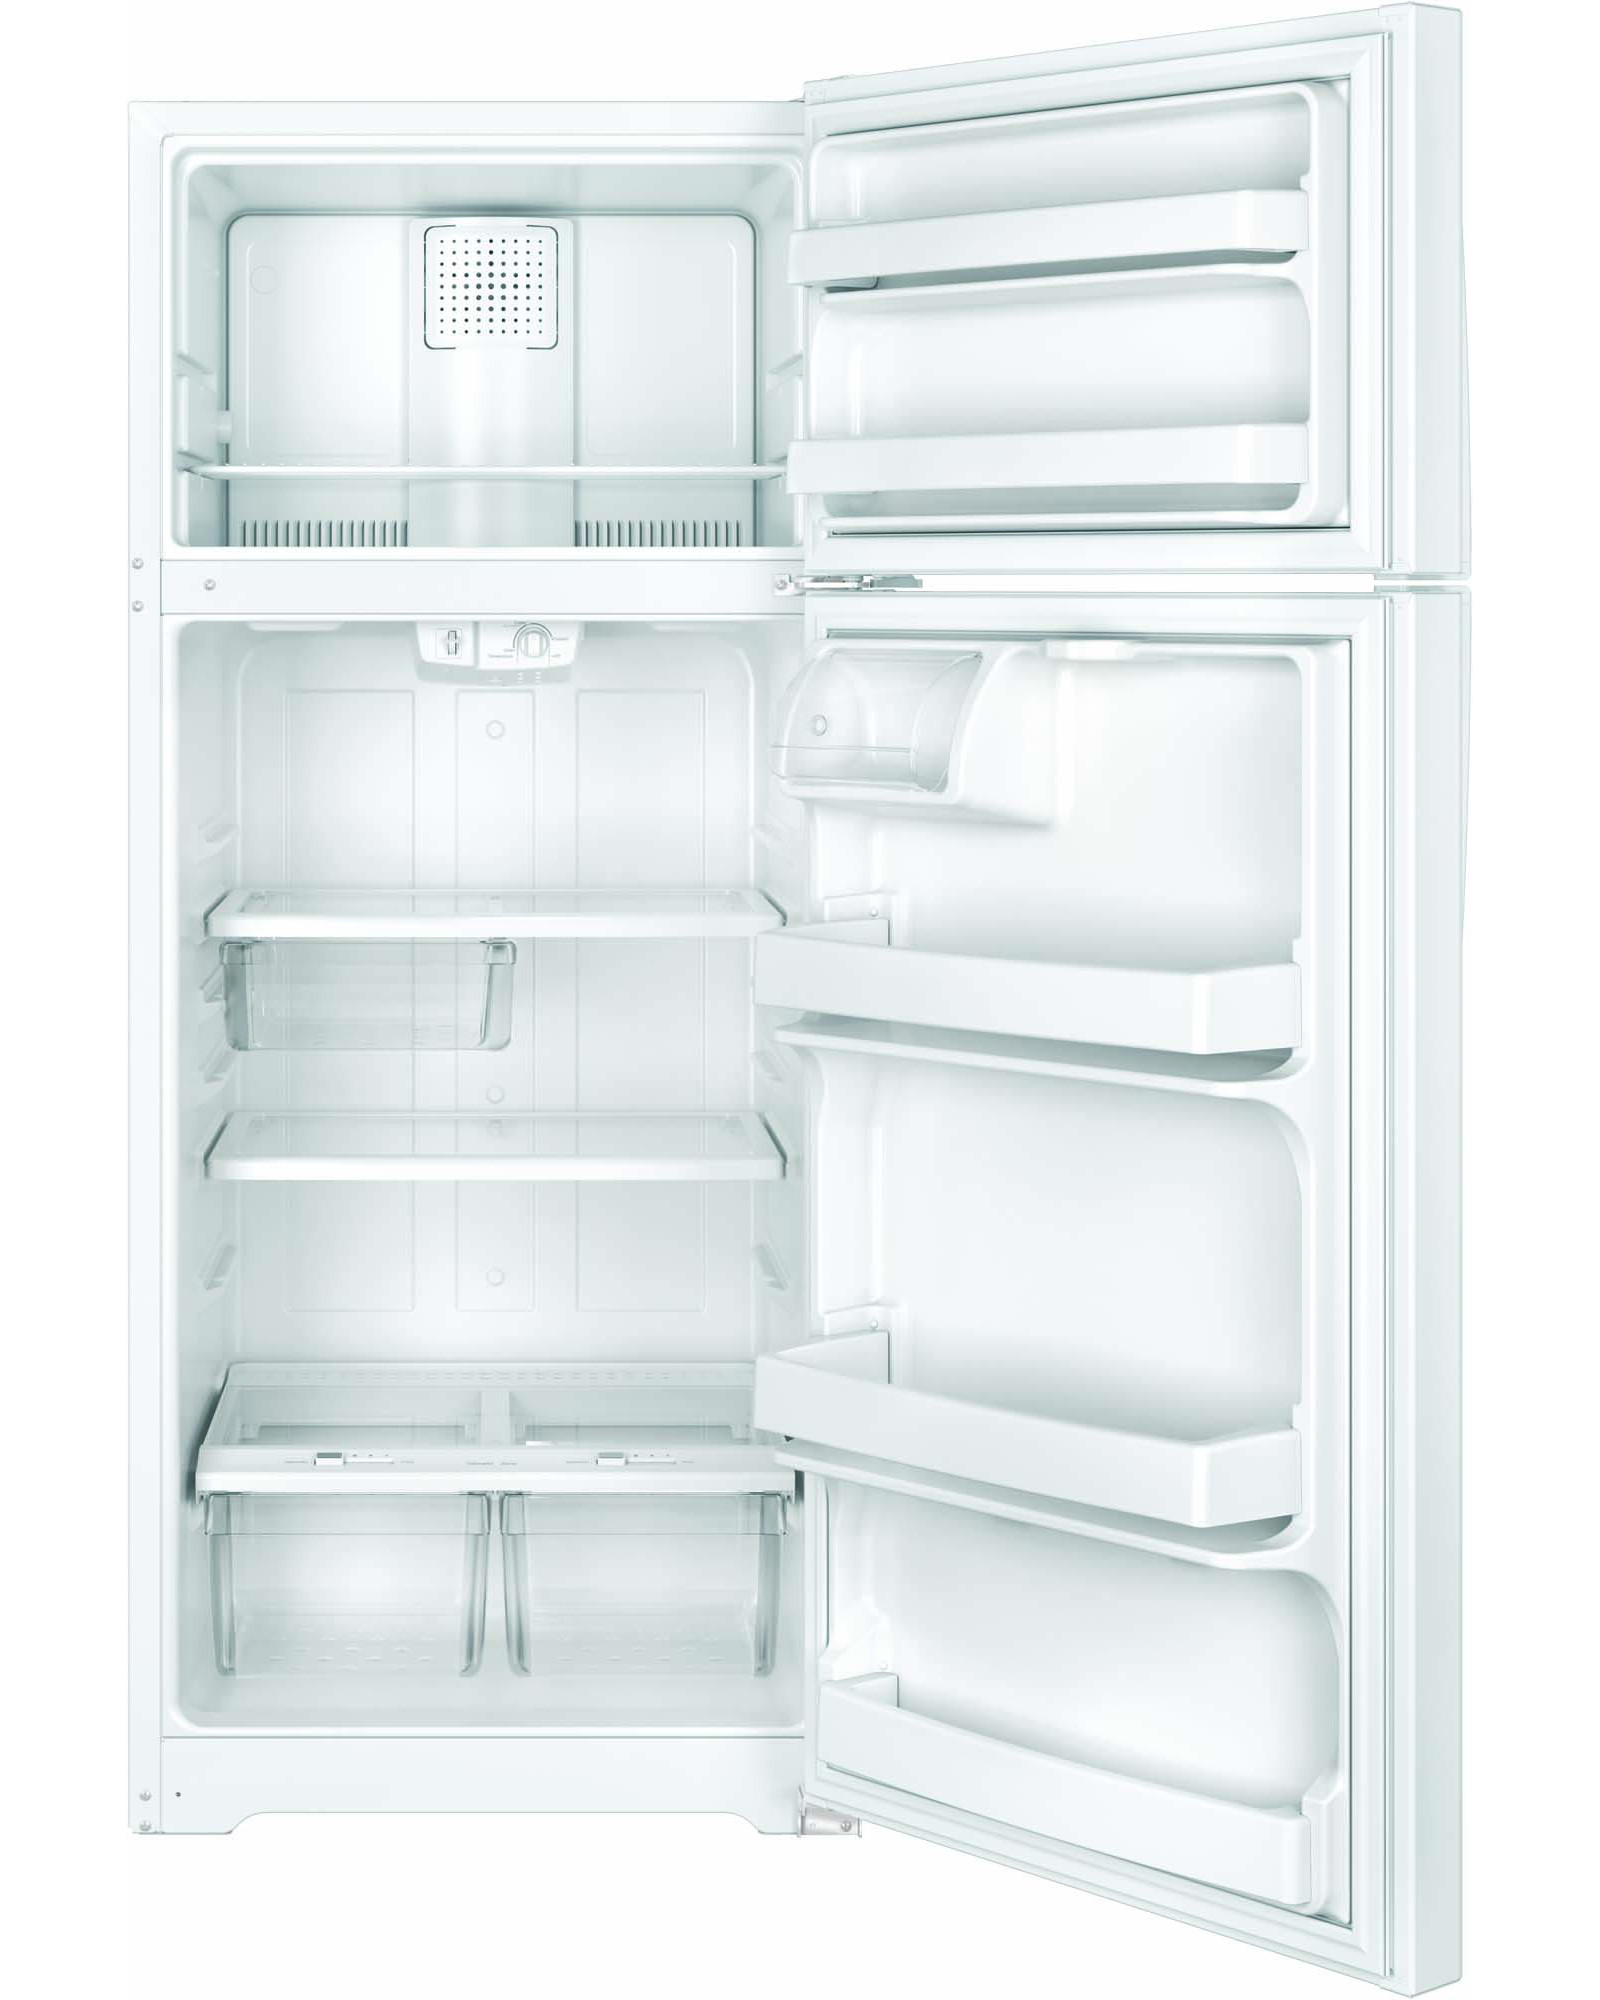 GE Appliances GTE18GTHWW 17.5 cu. ft. Top-Freezer Refrigerator - White